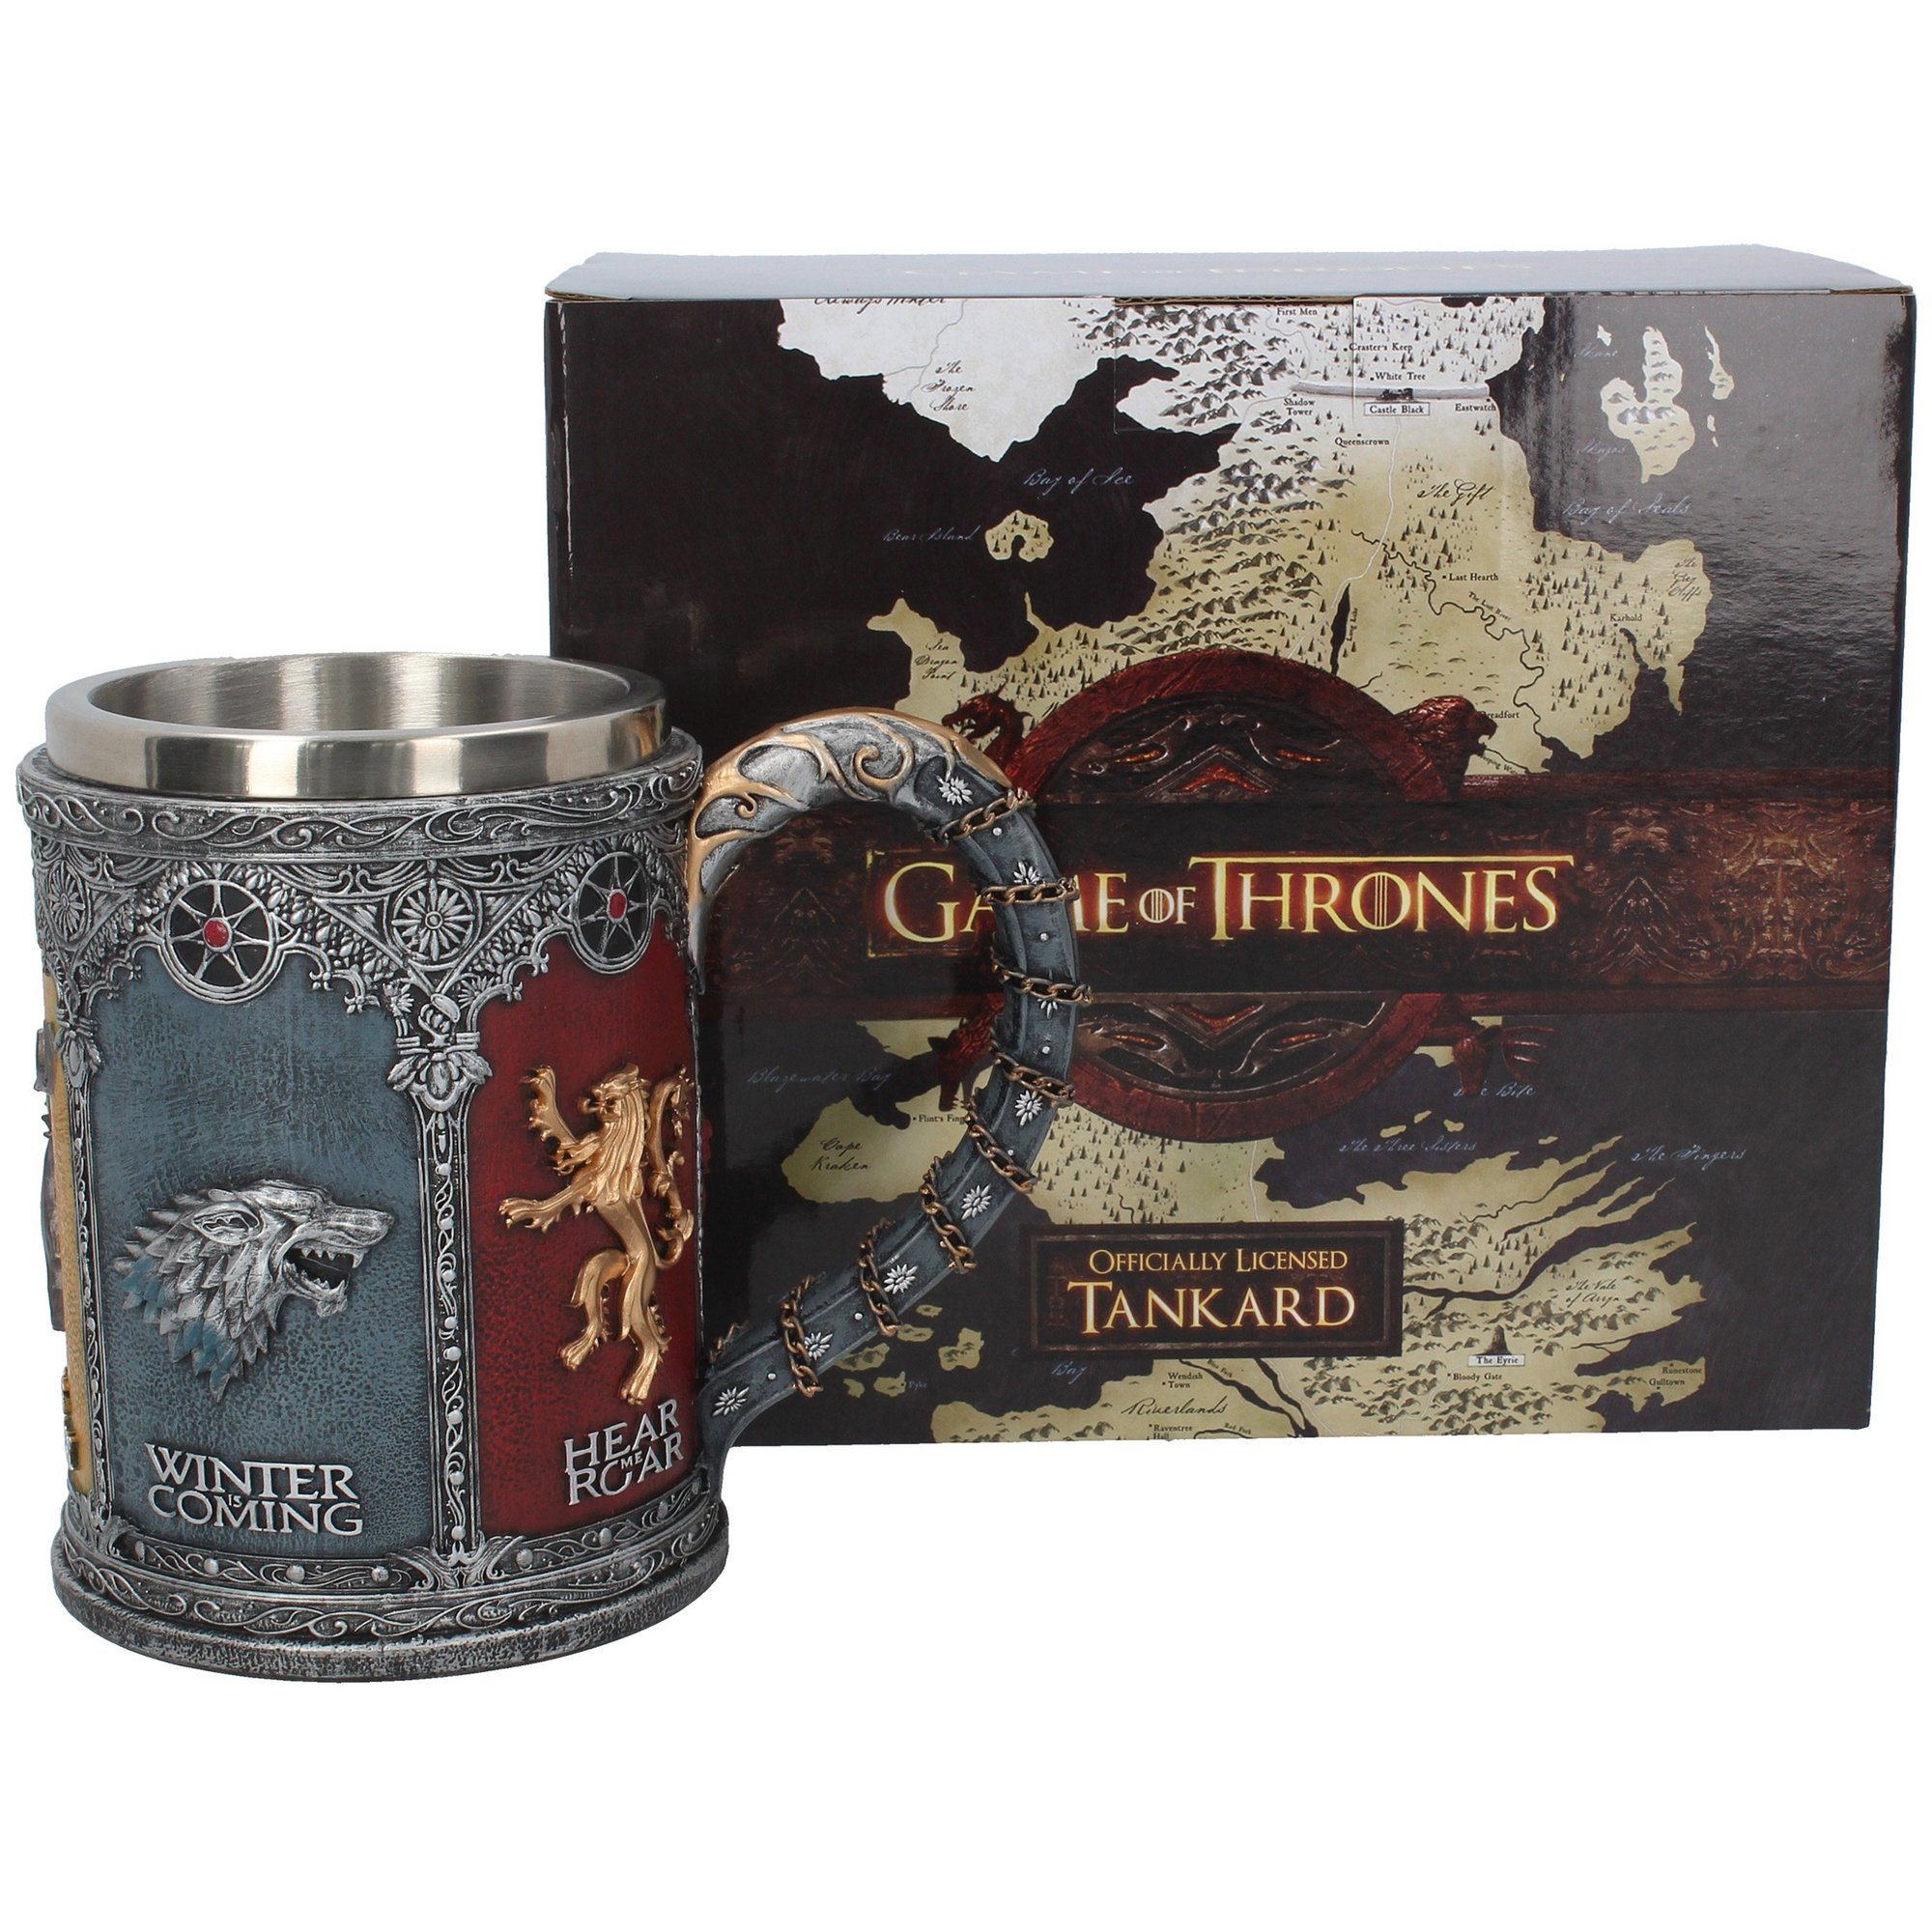 Image of Game of Thrones Sigil Tankard